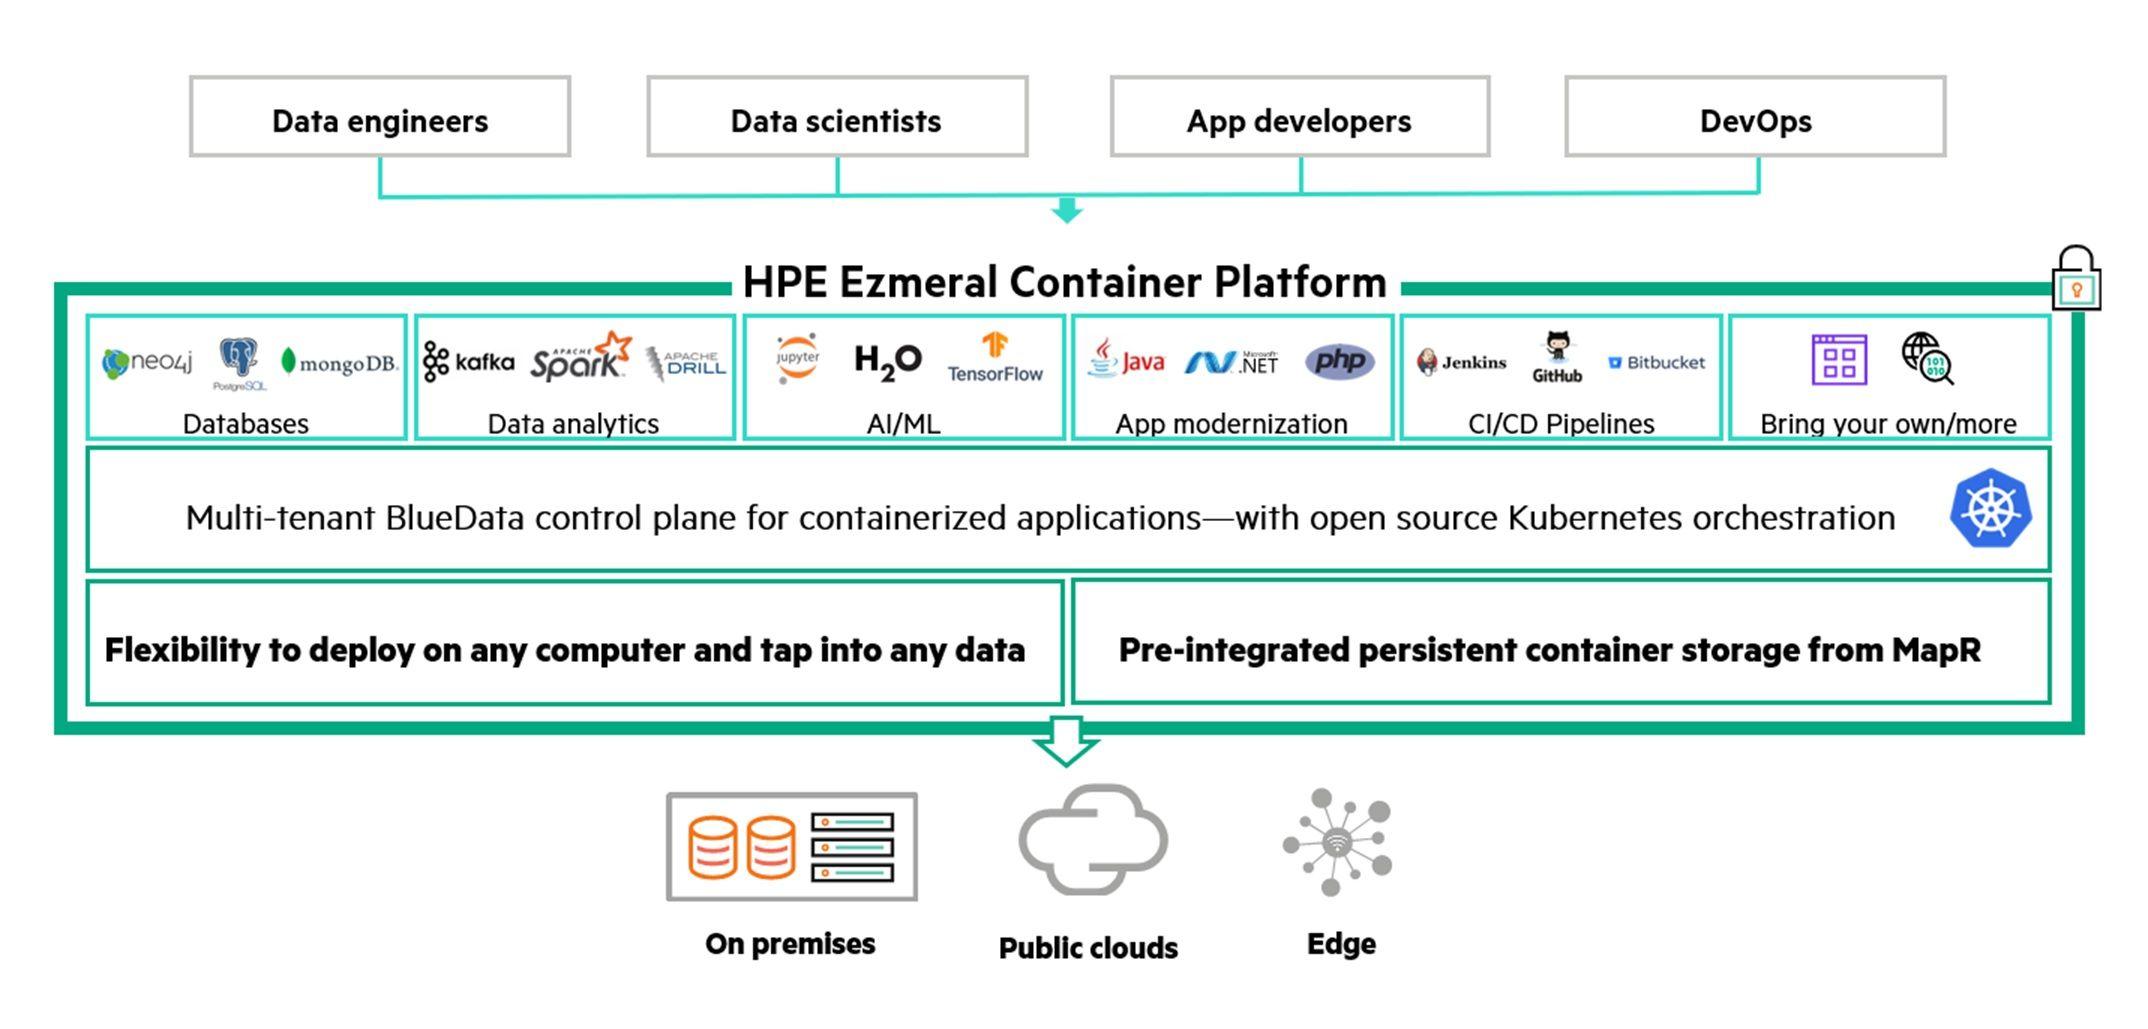 hpe-ezmeral-container-platform.jpg